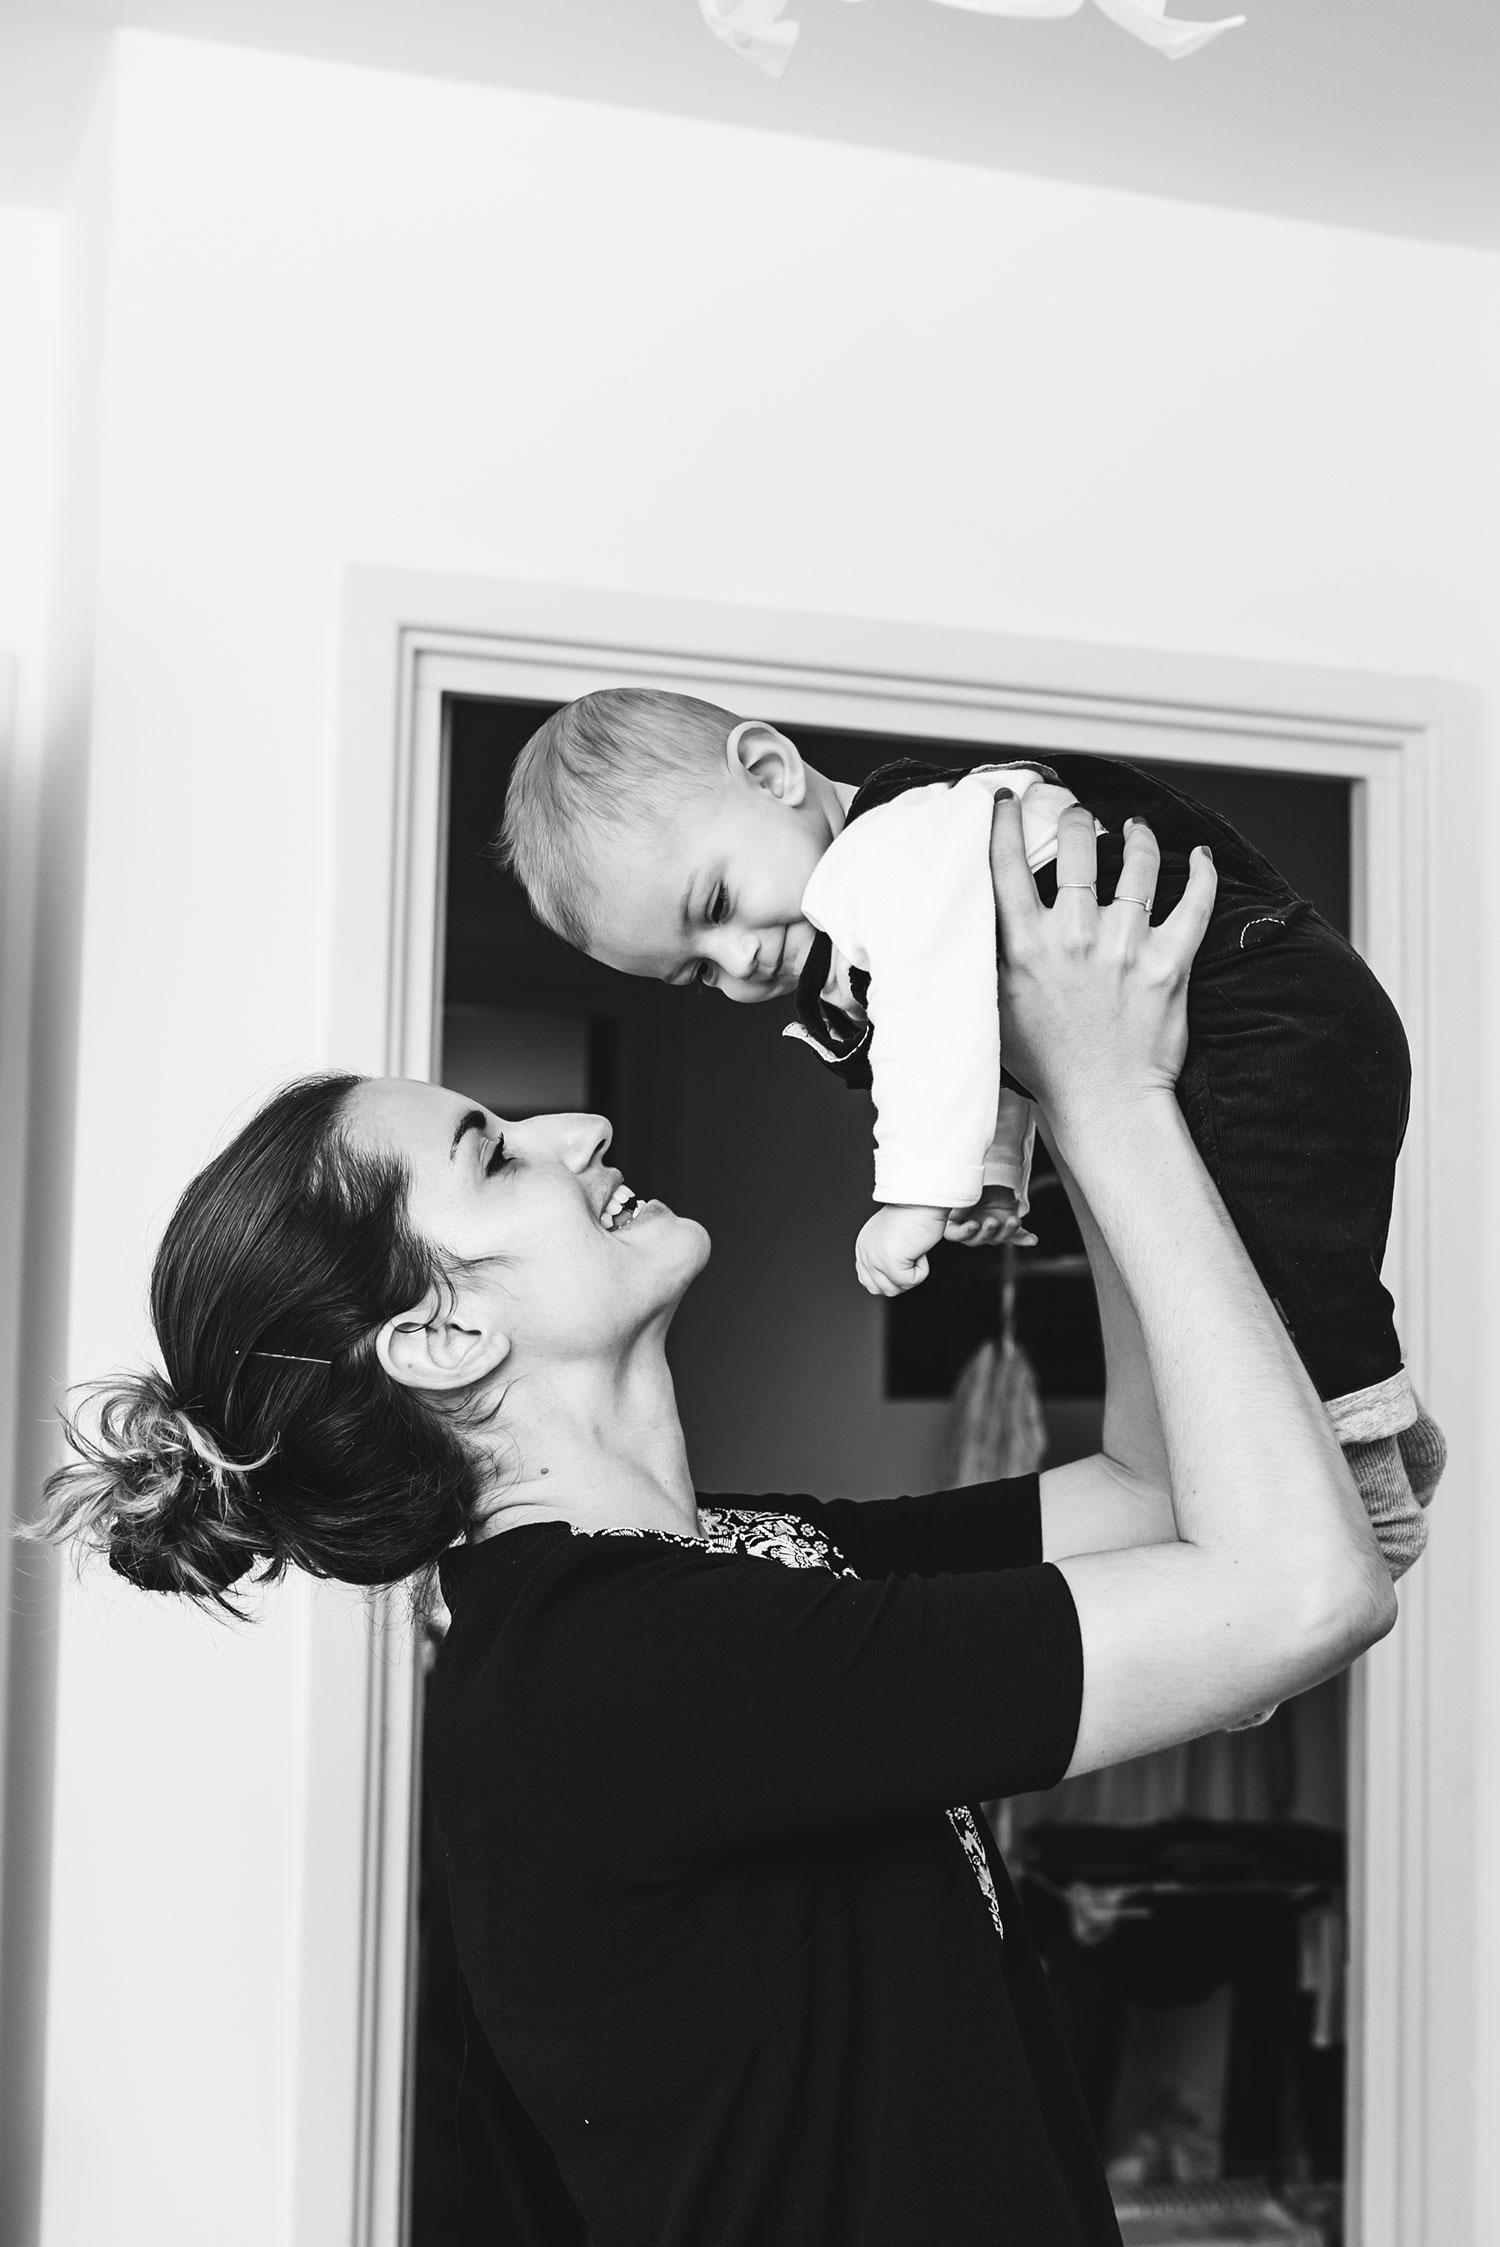 Beautiful-mum-playing-son-air-stella-lebel.jpg